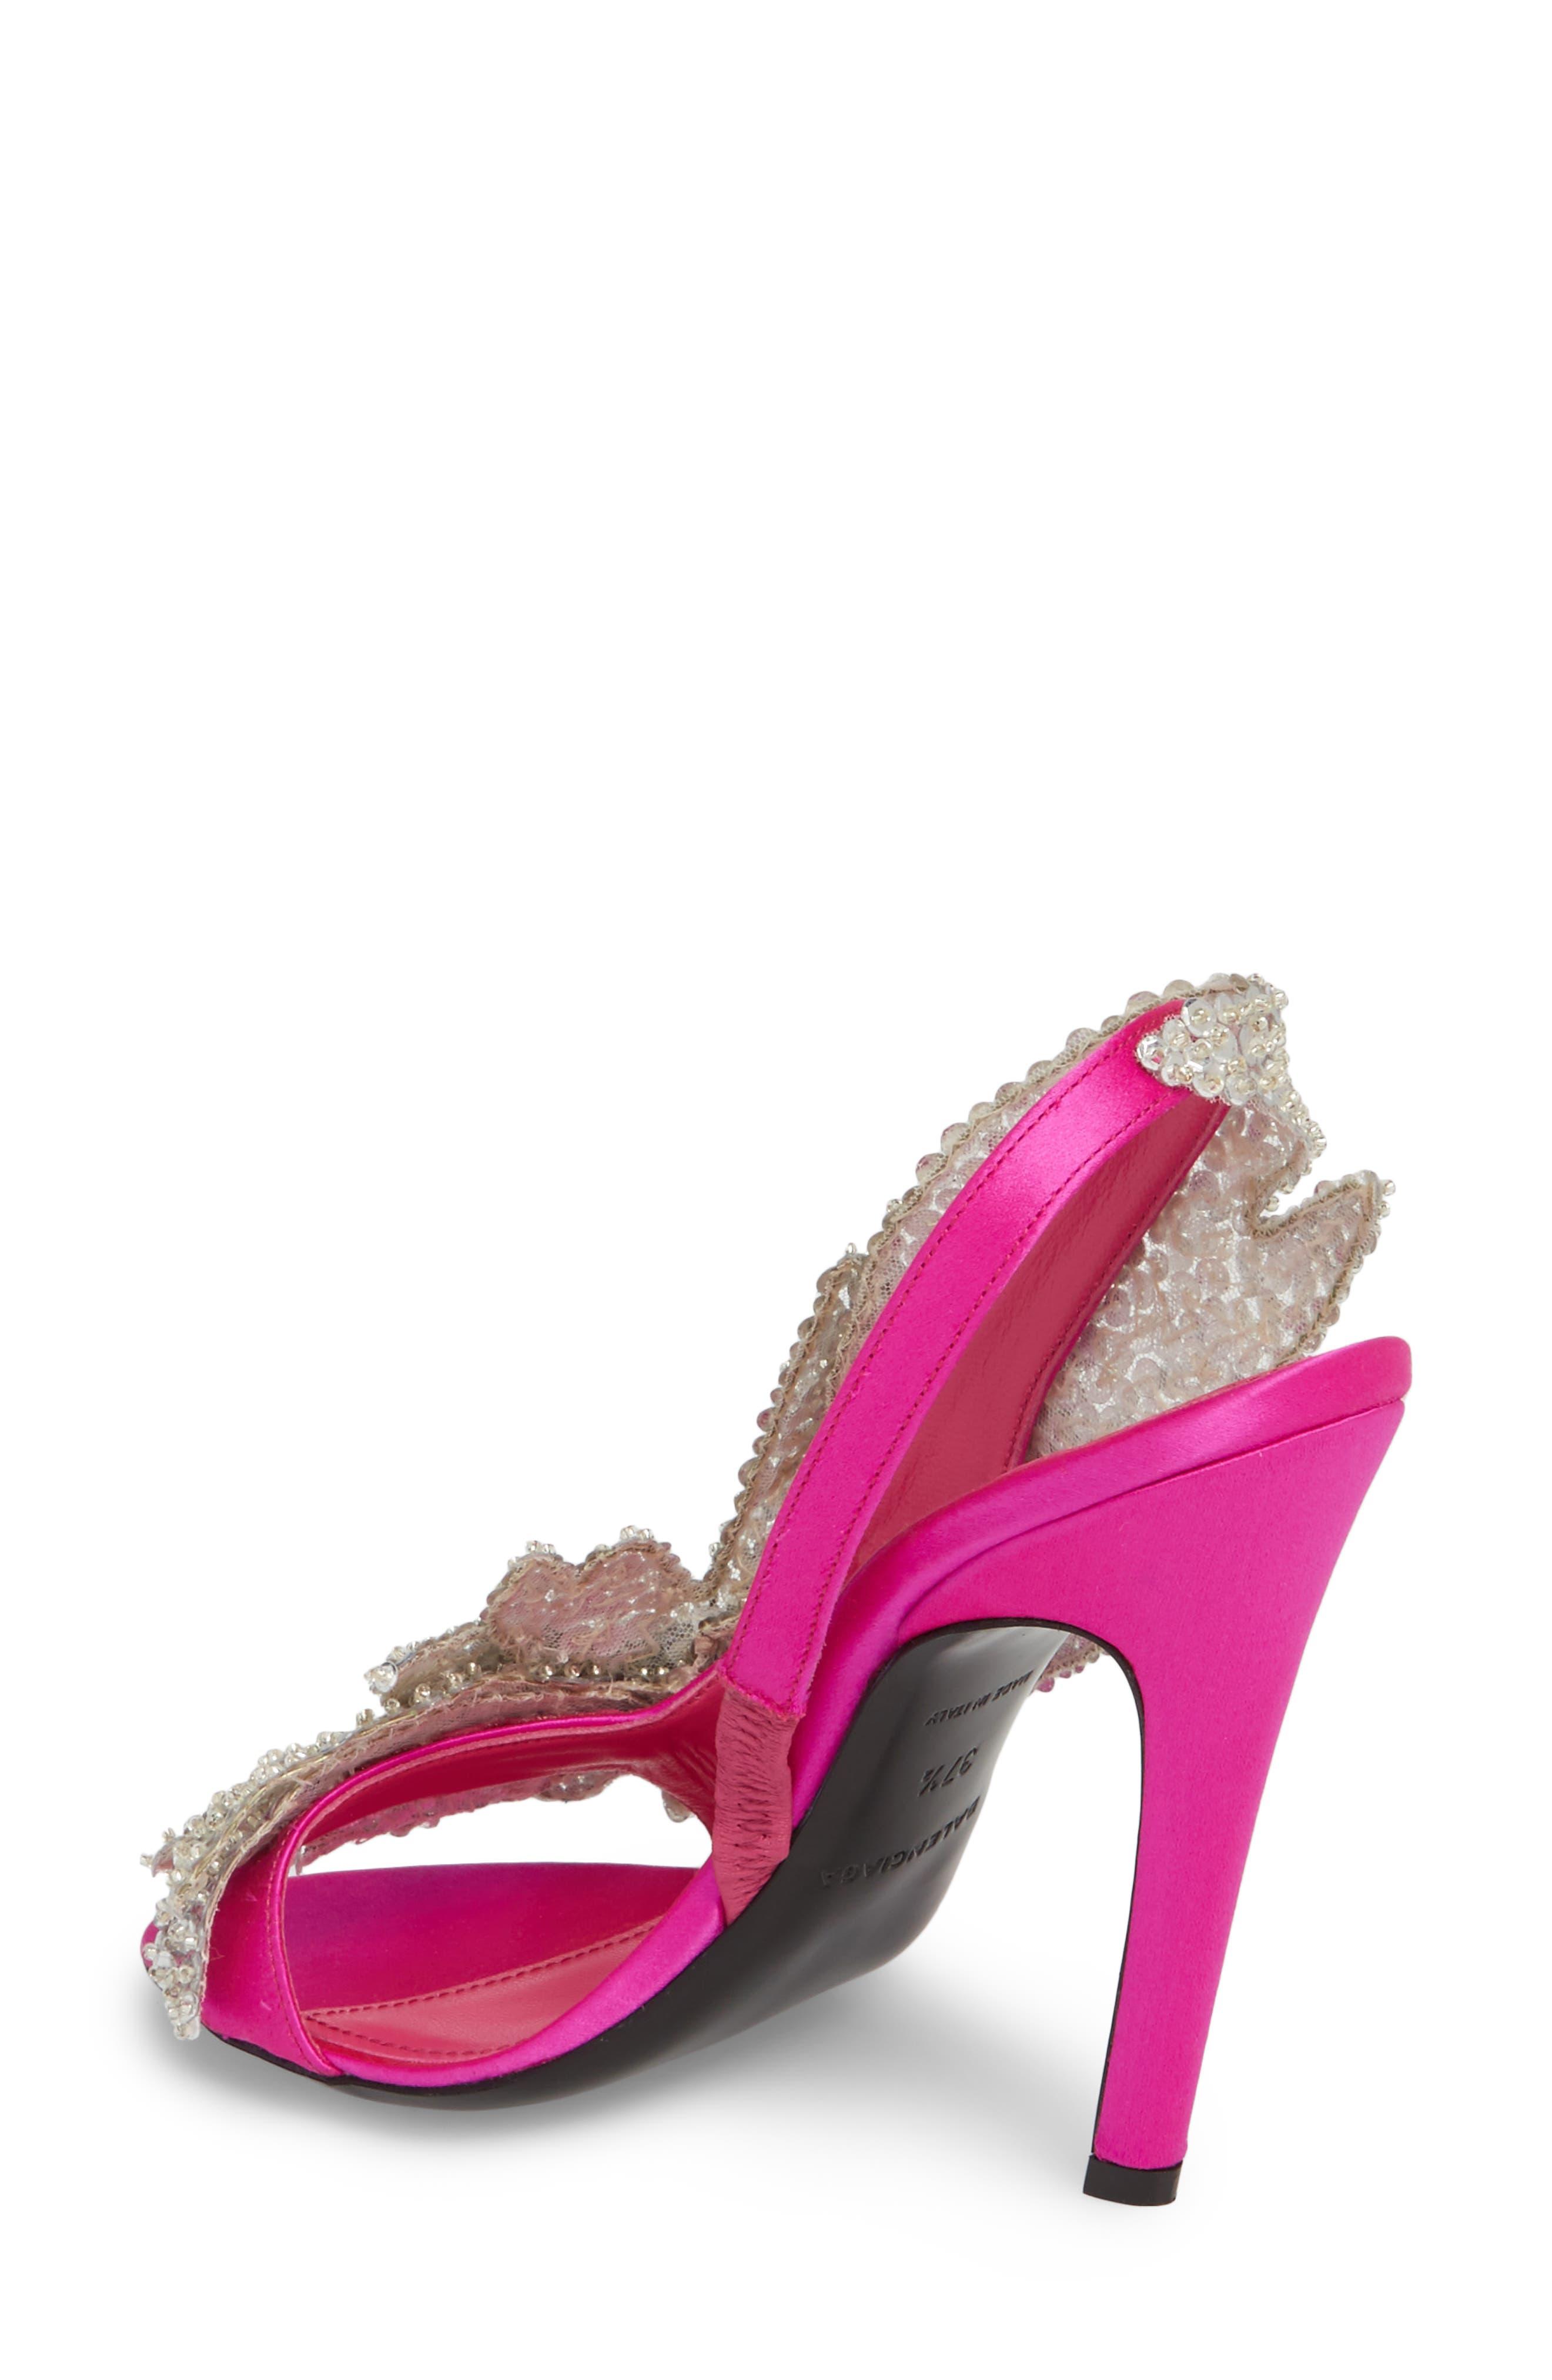 Embellished Slingback Sandal,                             Alternate thumbnail 2, color,                             Rose Fuchsia/ Crystal